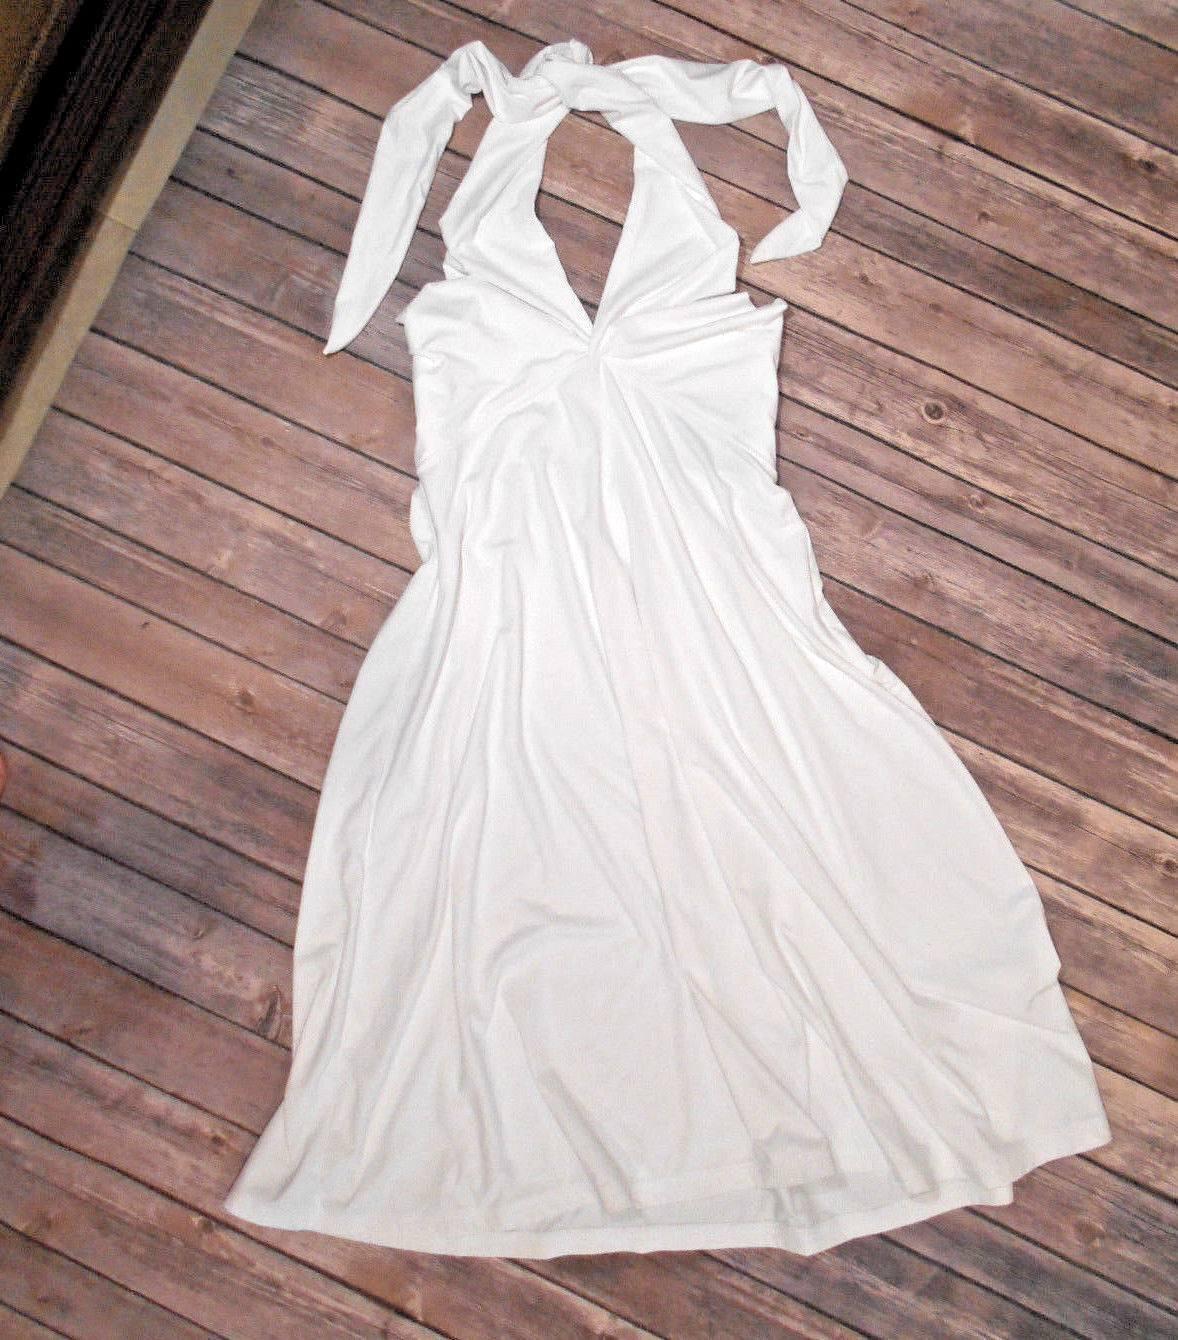 .. NWT TITLE NINE White 3 Way PIN UP XL Stretchy Marilyn Monroe 1940 Retro